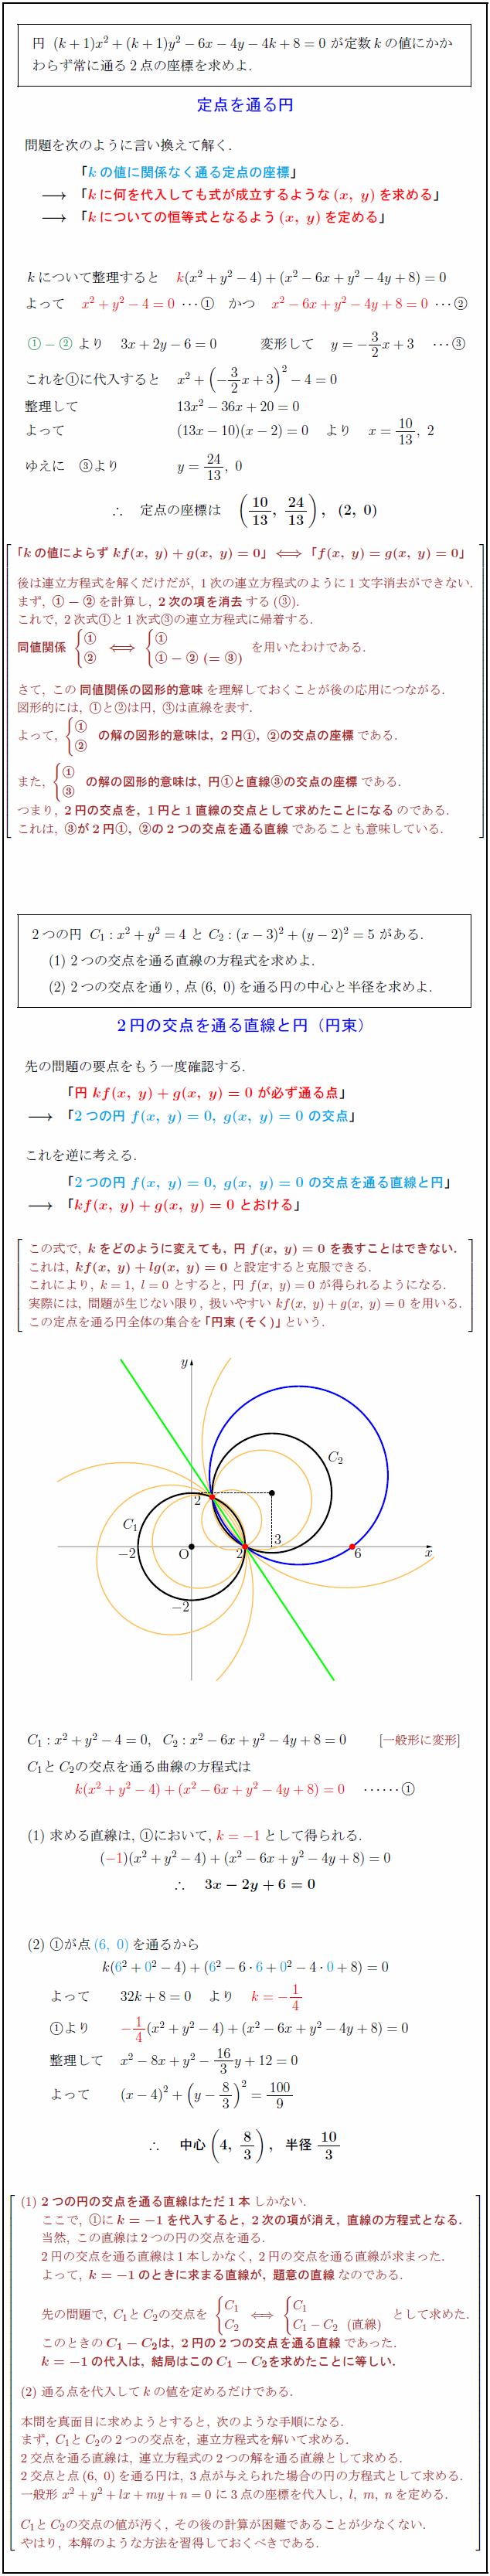 pencil-circle